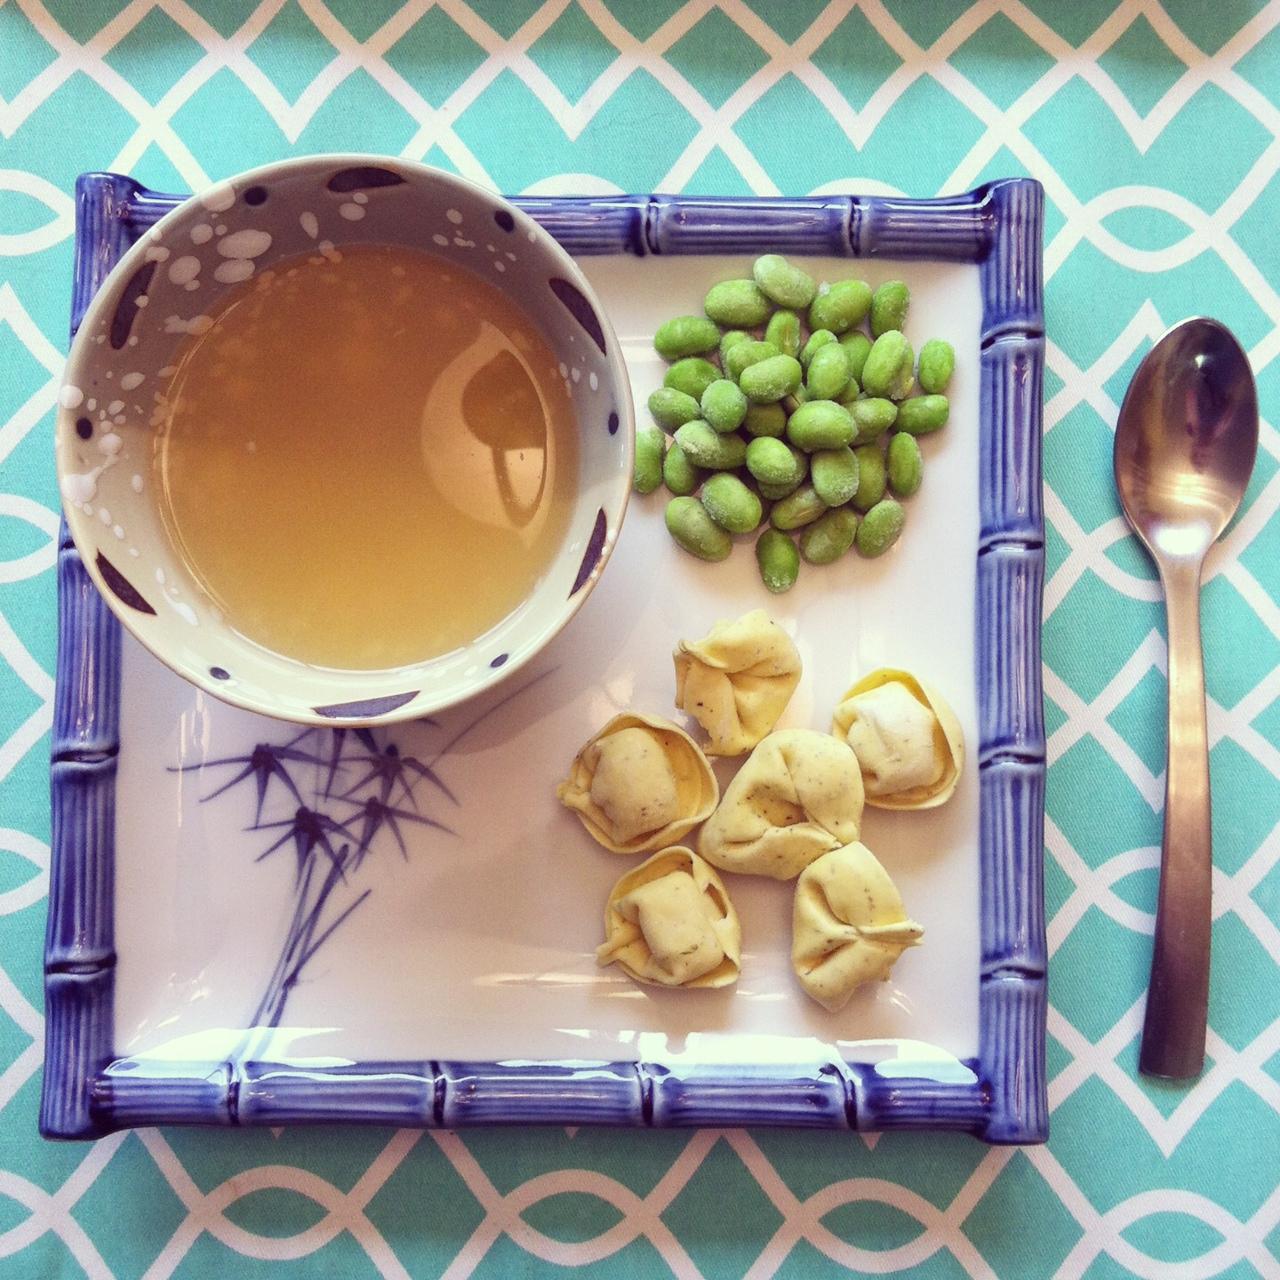 Tortellin soup deconstructed